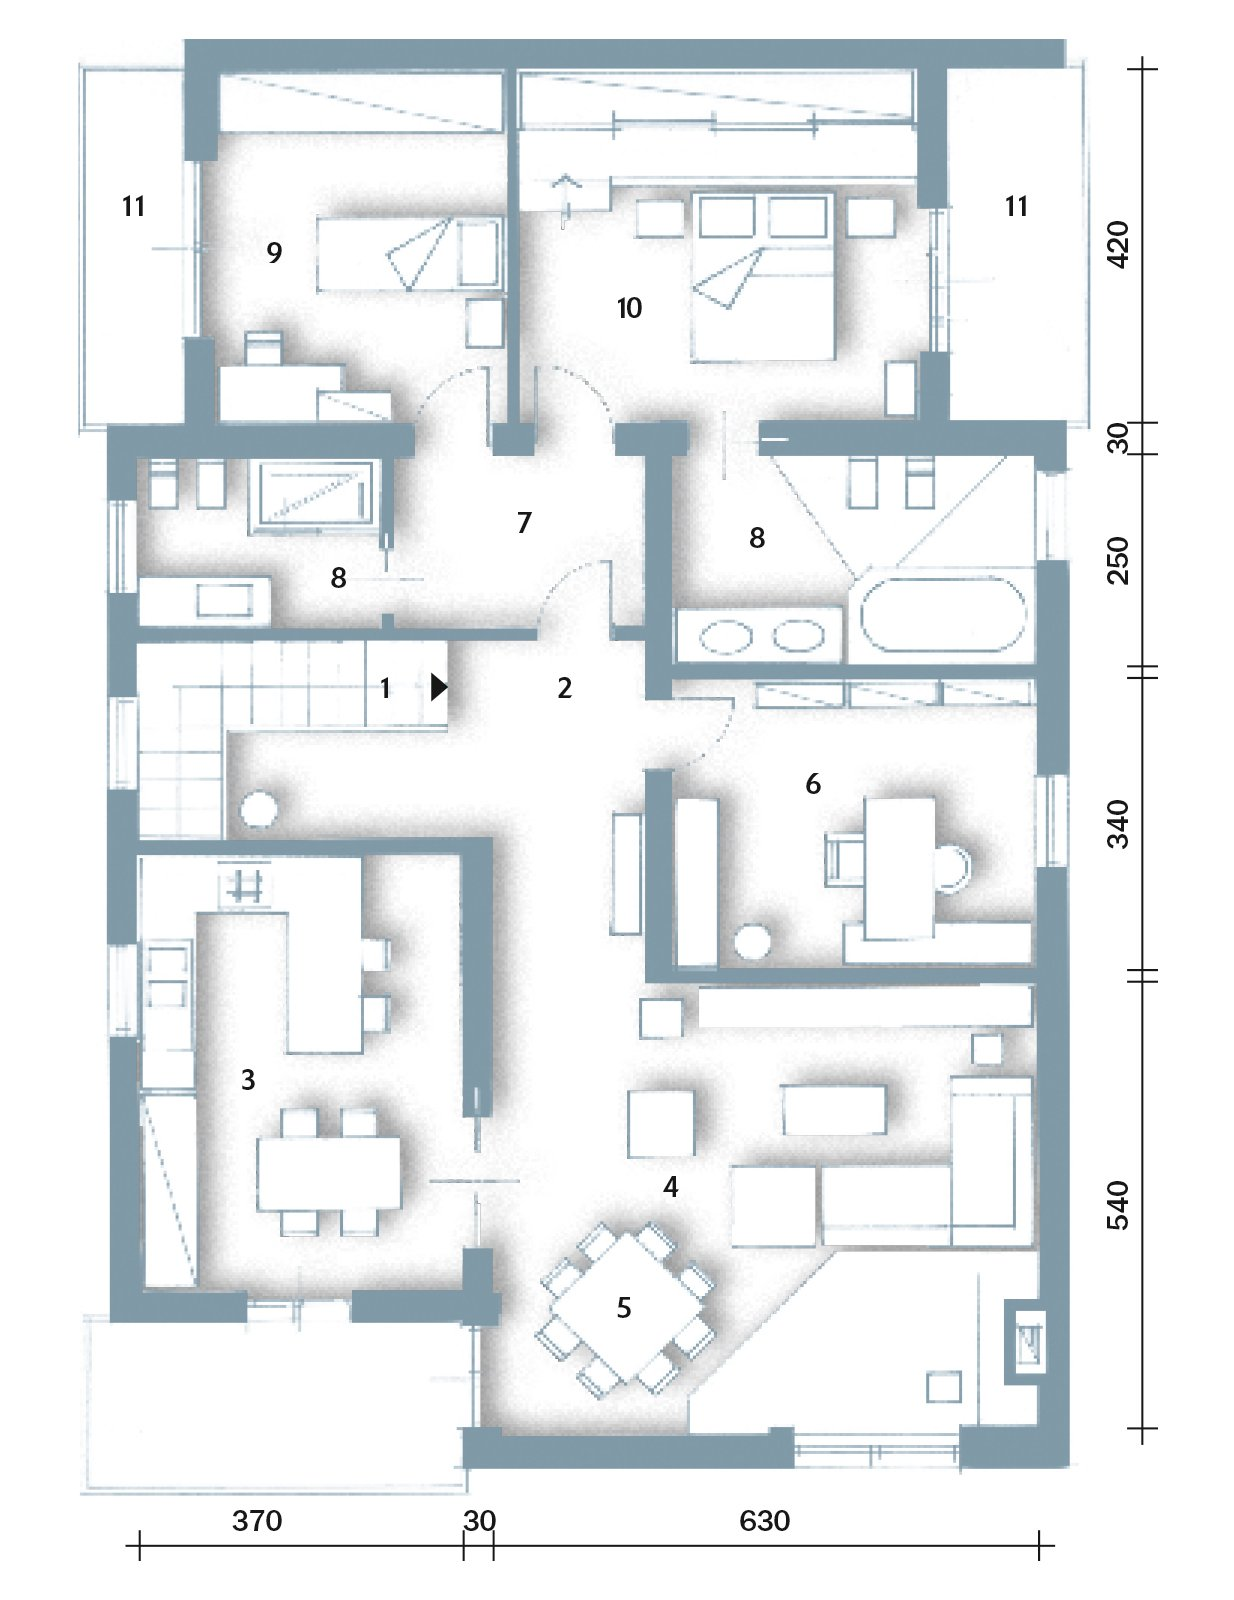 Una casa moderna su livelli sfalsati cose di casa for Piante di case